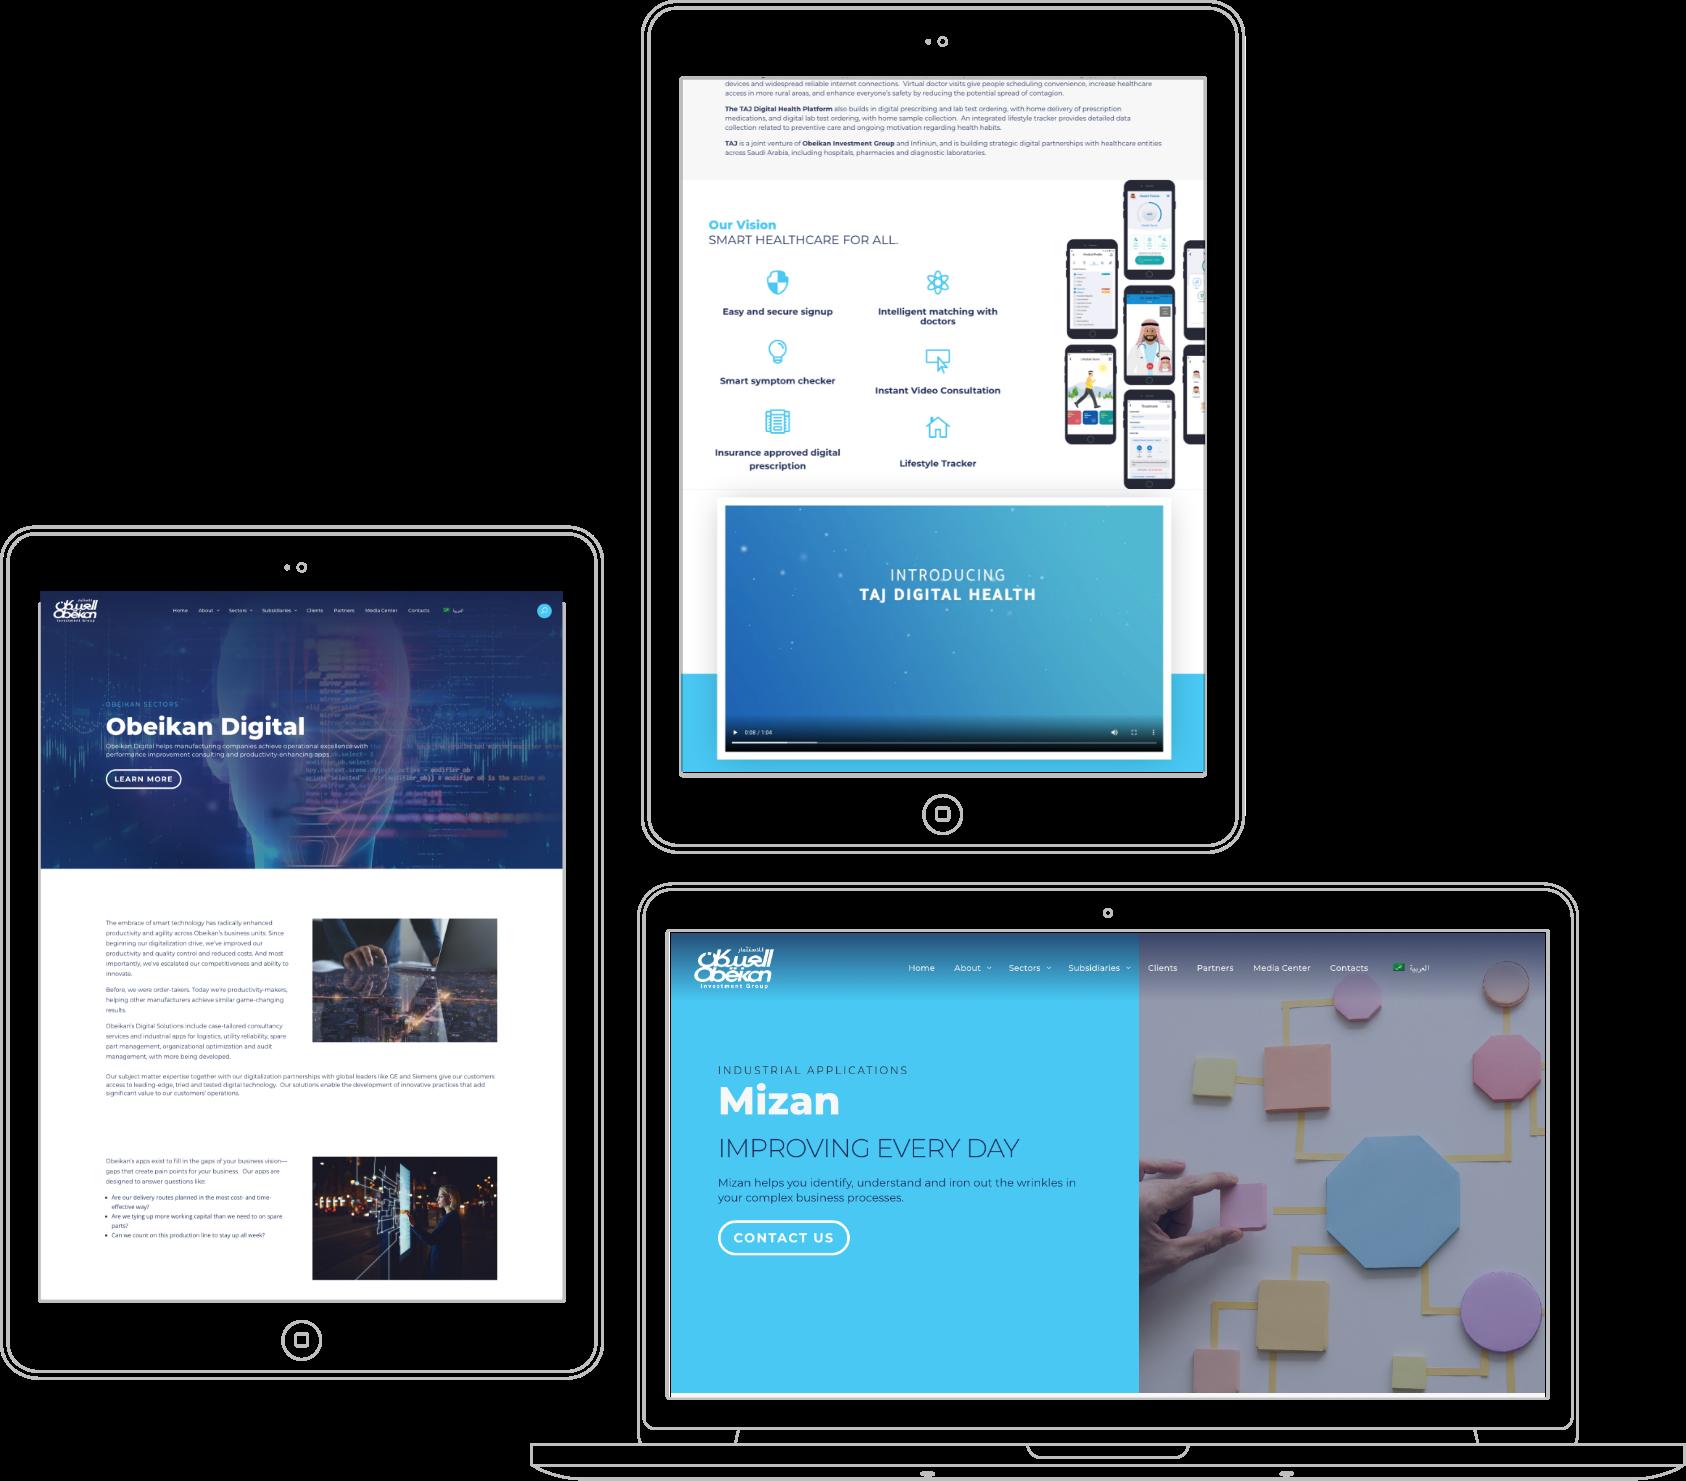 webdesign UI UX Obeikan